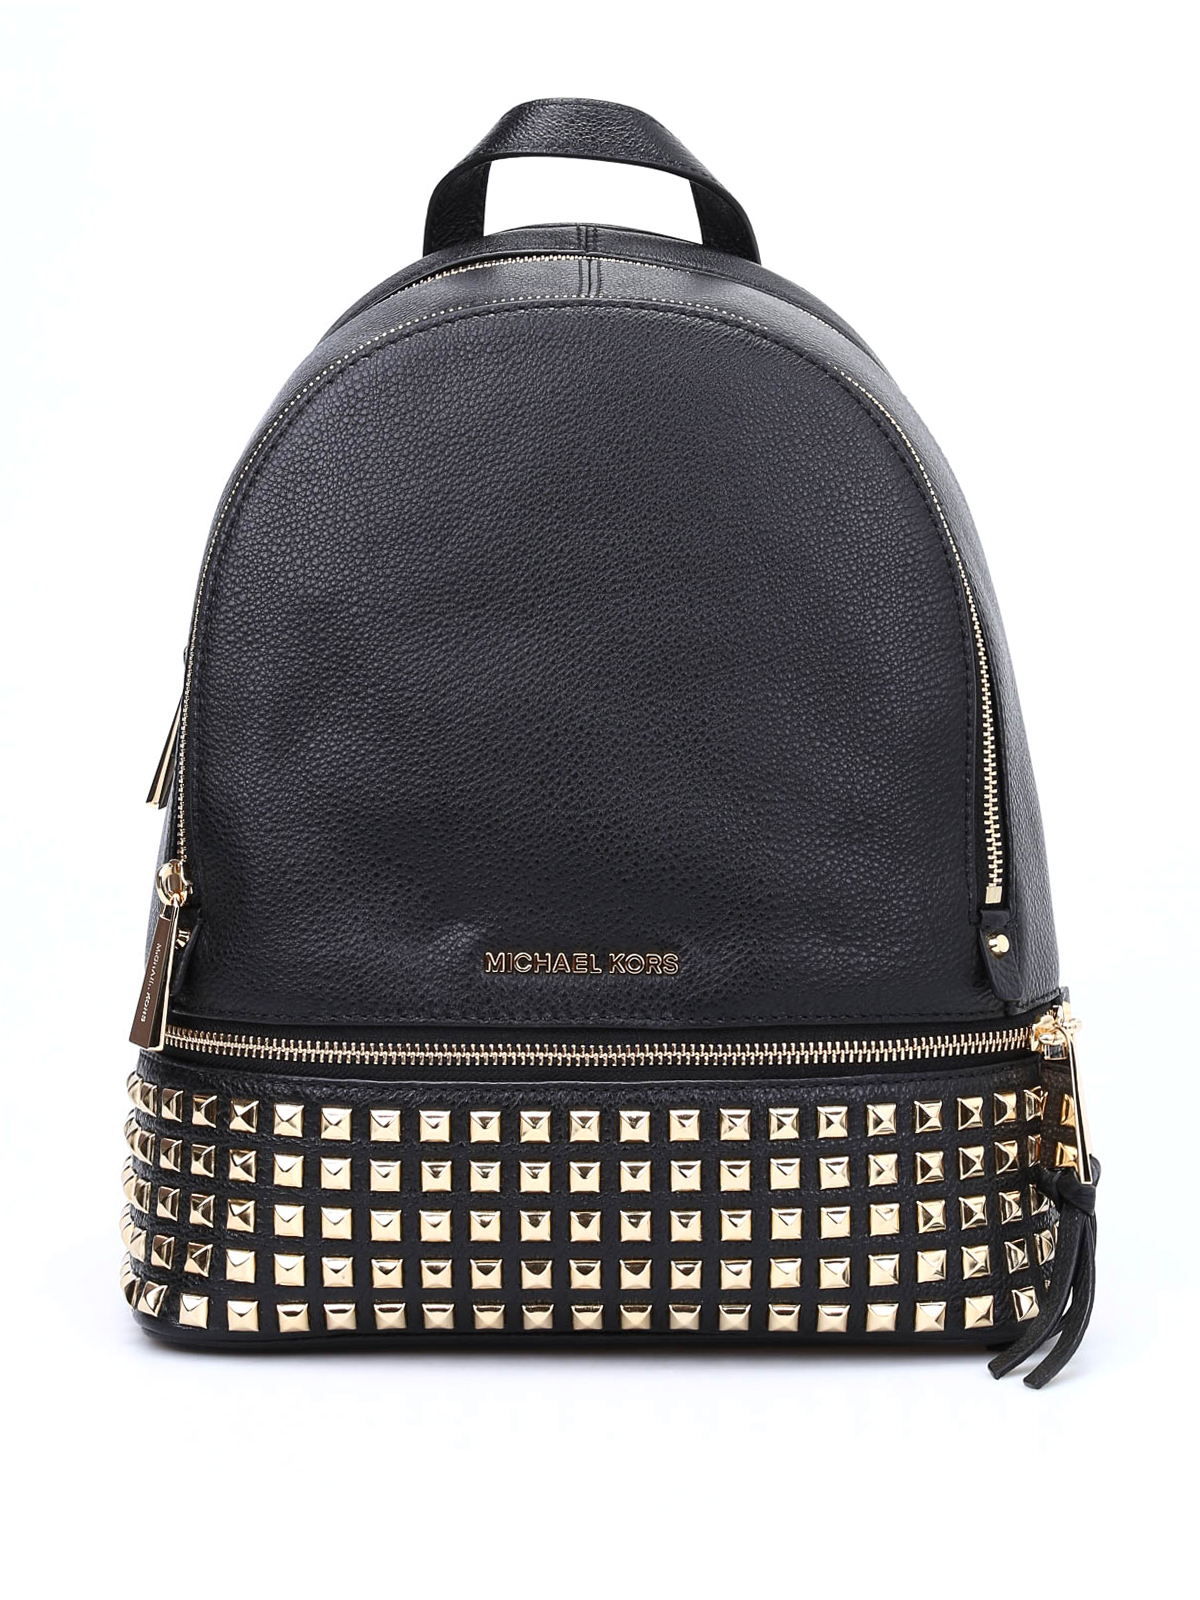 958dff44c1 ... cheapest michael kors backpacks rhea medium studded backpack cca33 15702